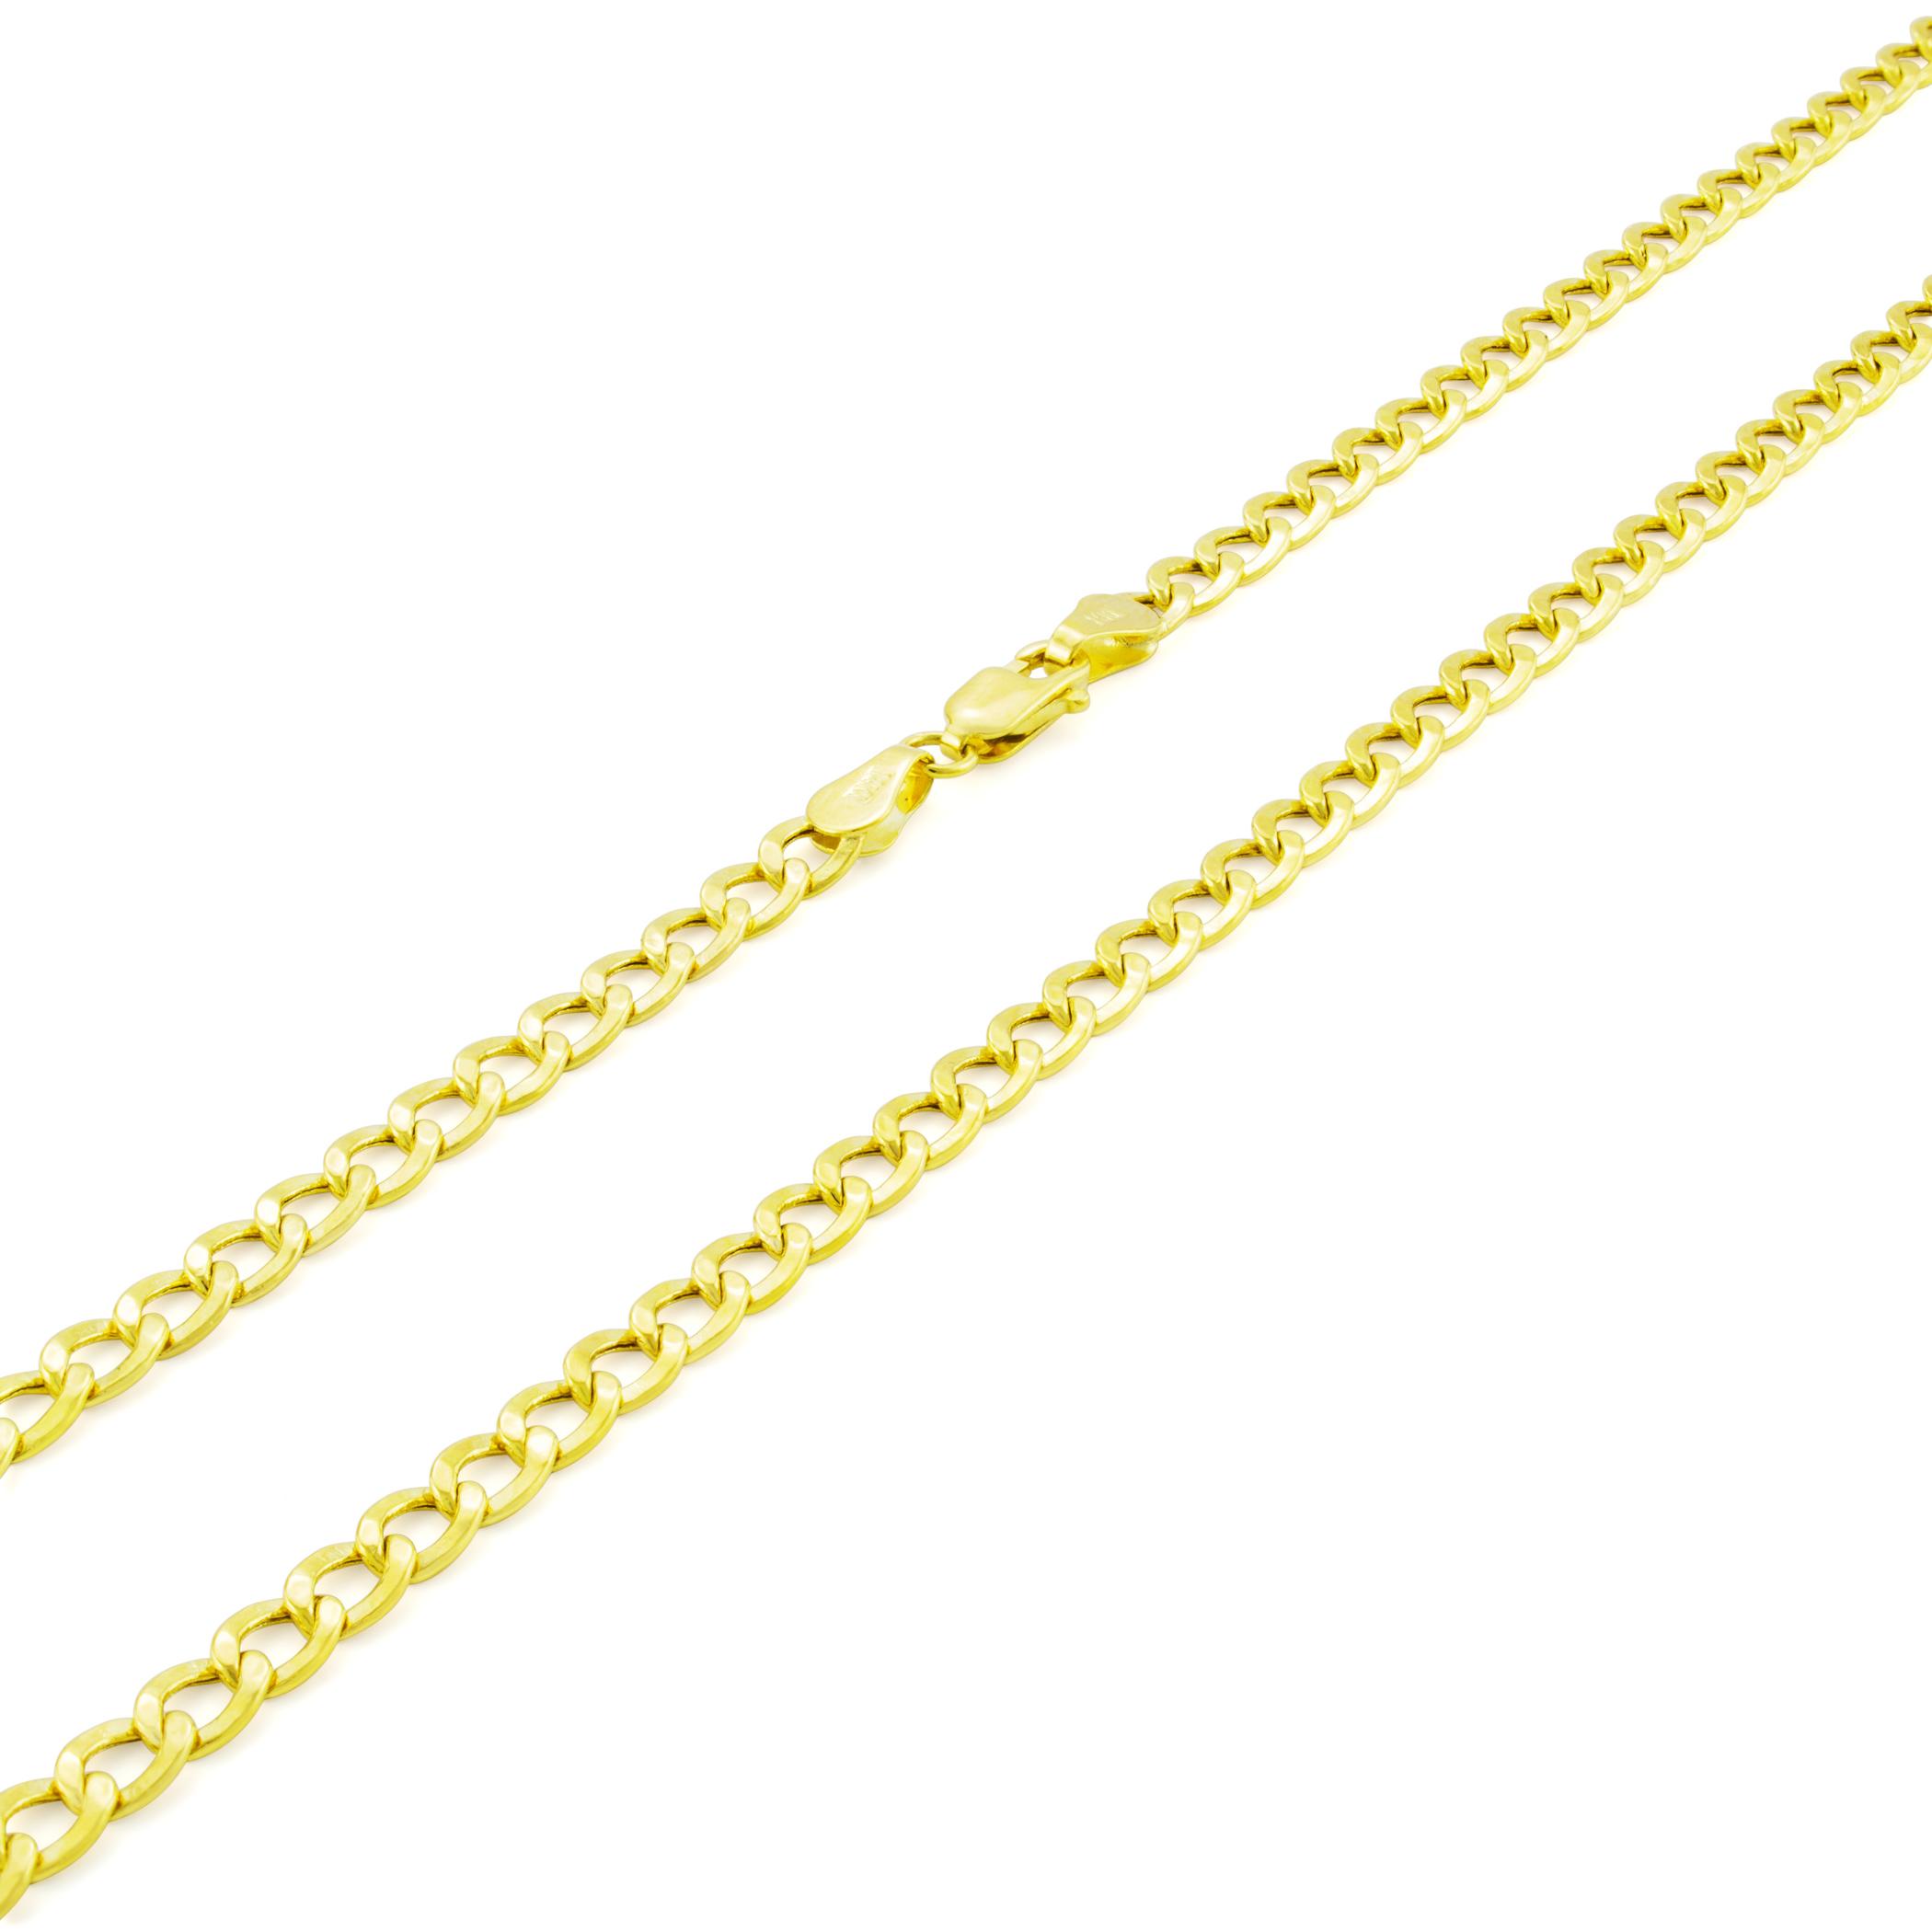 14K-Yellow-Gold-3-5mm-Women-Curb-Cuban-Chain-Link-Bracelet-Anklet-Chain-7-034-8-034-9-034 thumbnail 17